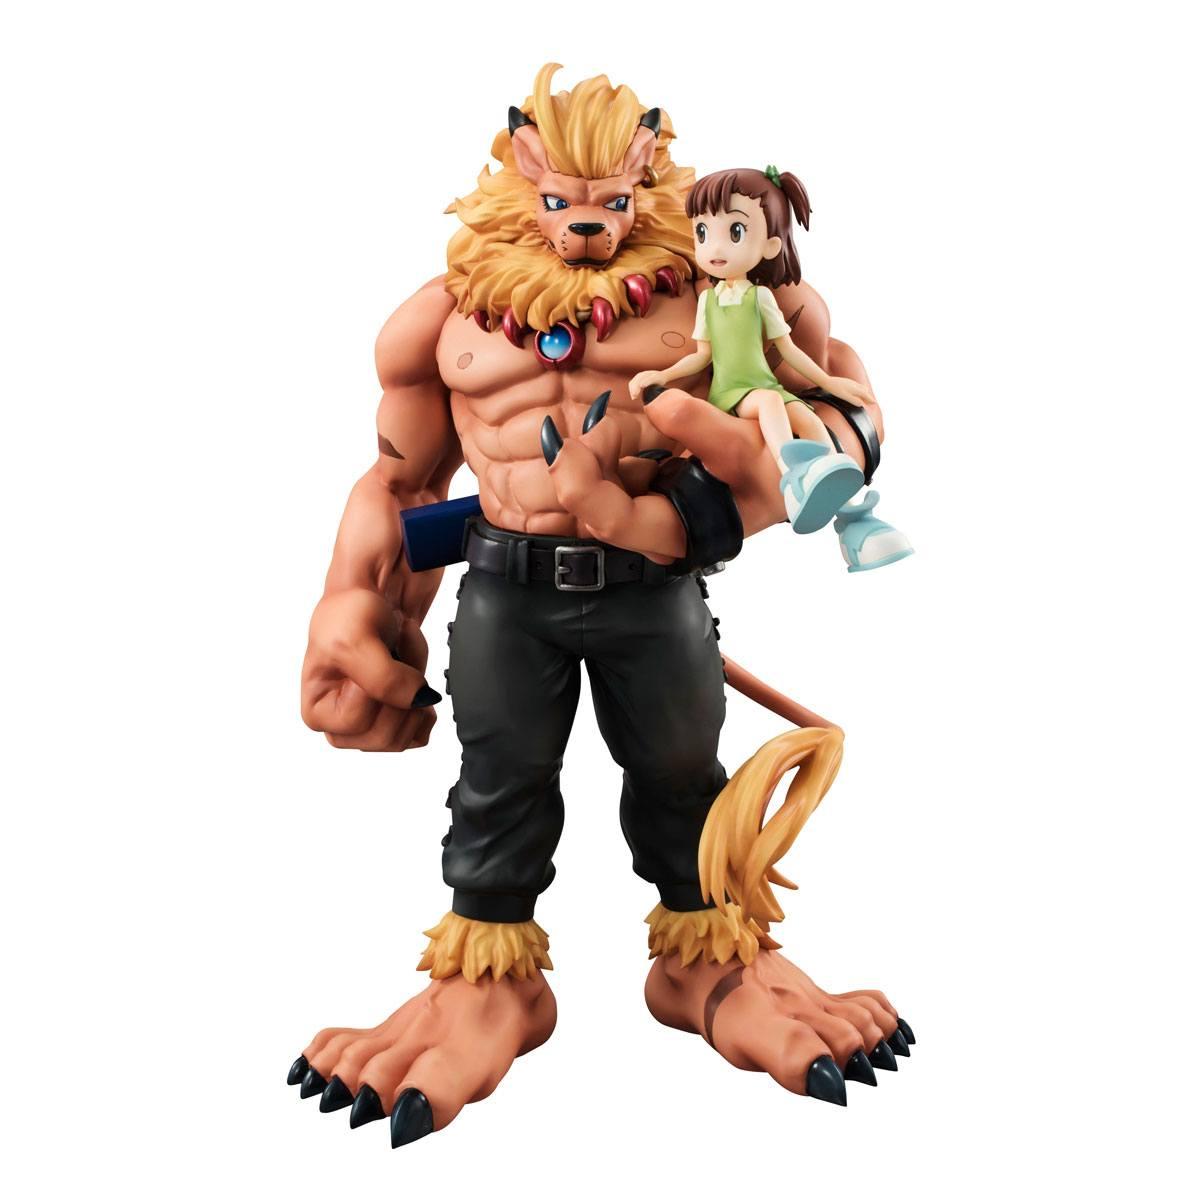 Digimon Tamers G.E.M. Series PVC Statue Leomon & Kato Jyuri 19 cm